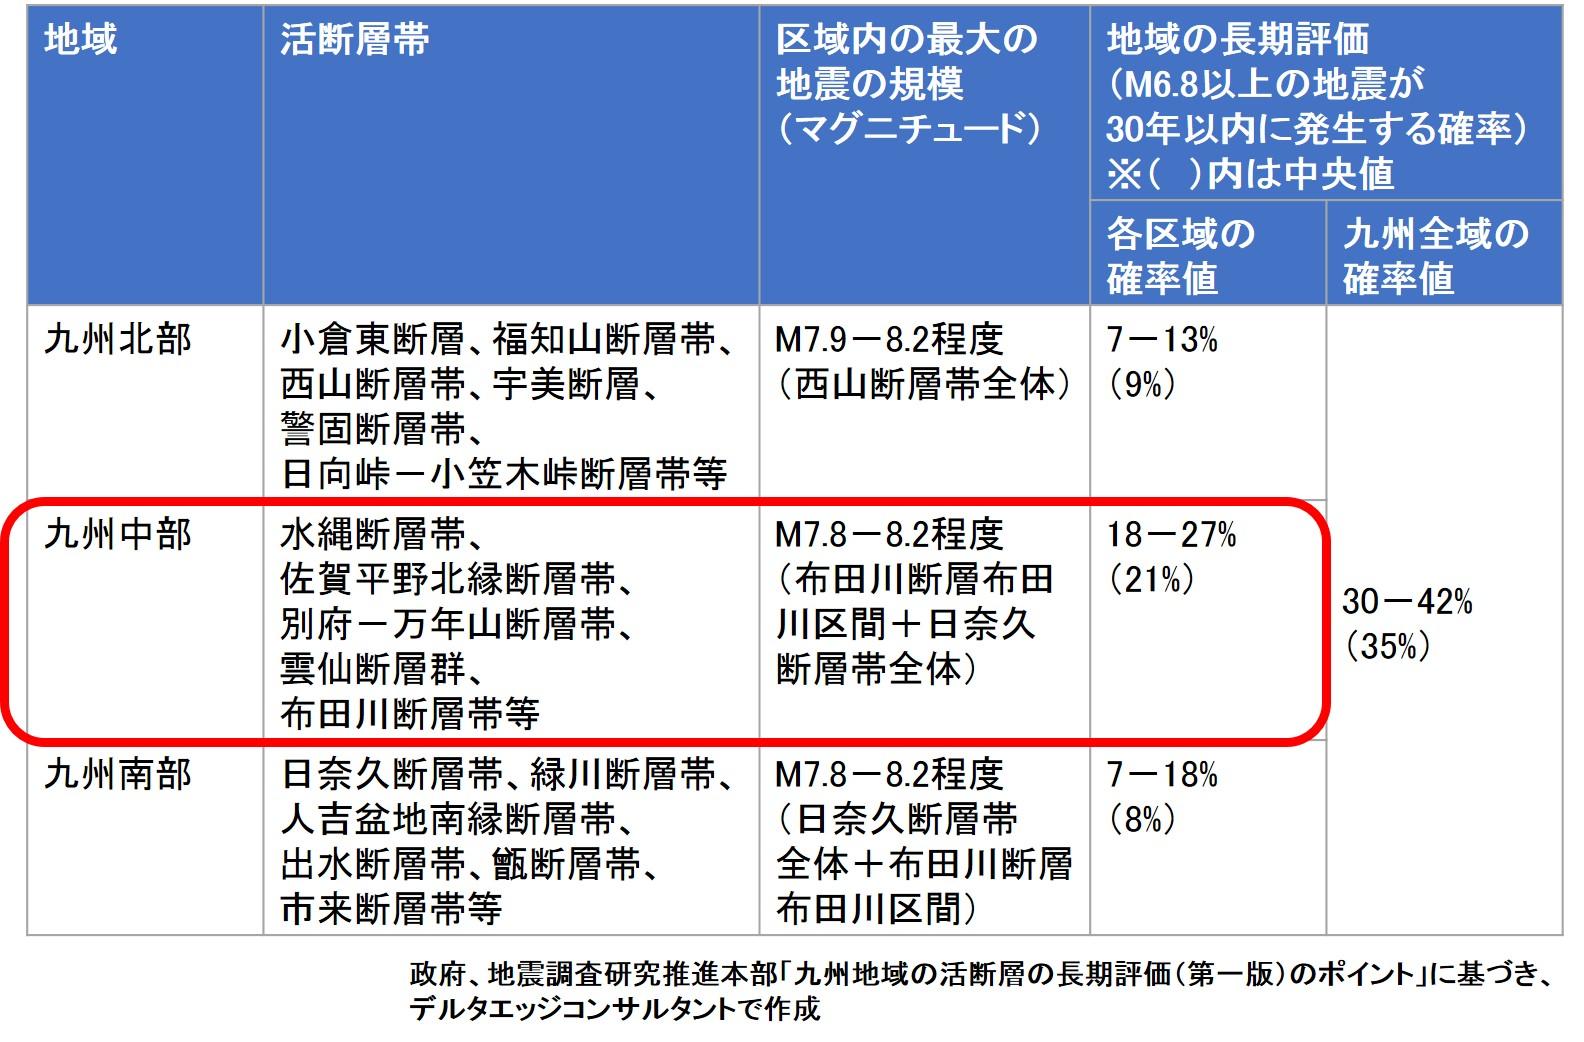 九州地域の活断層の長期評価